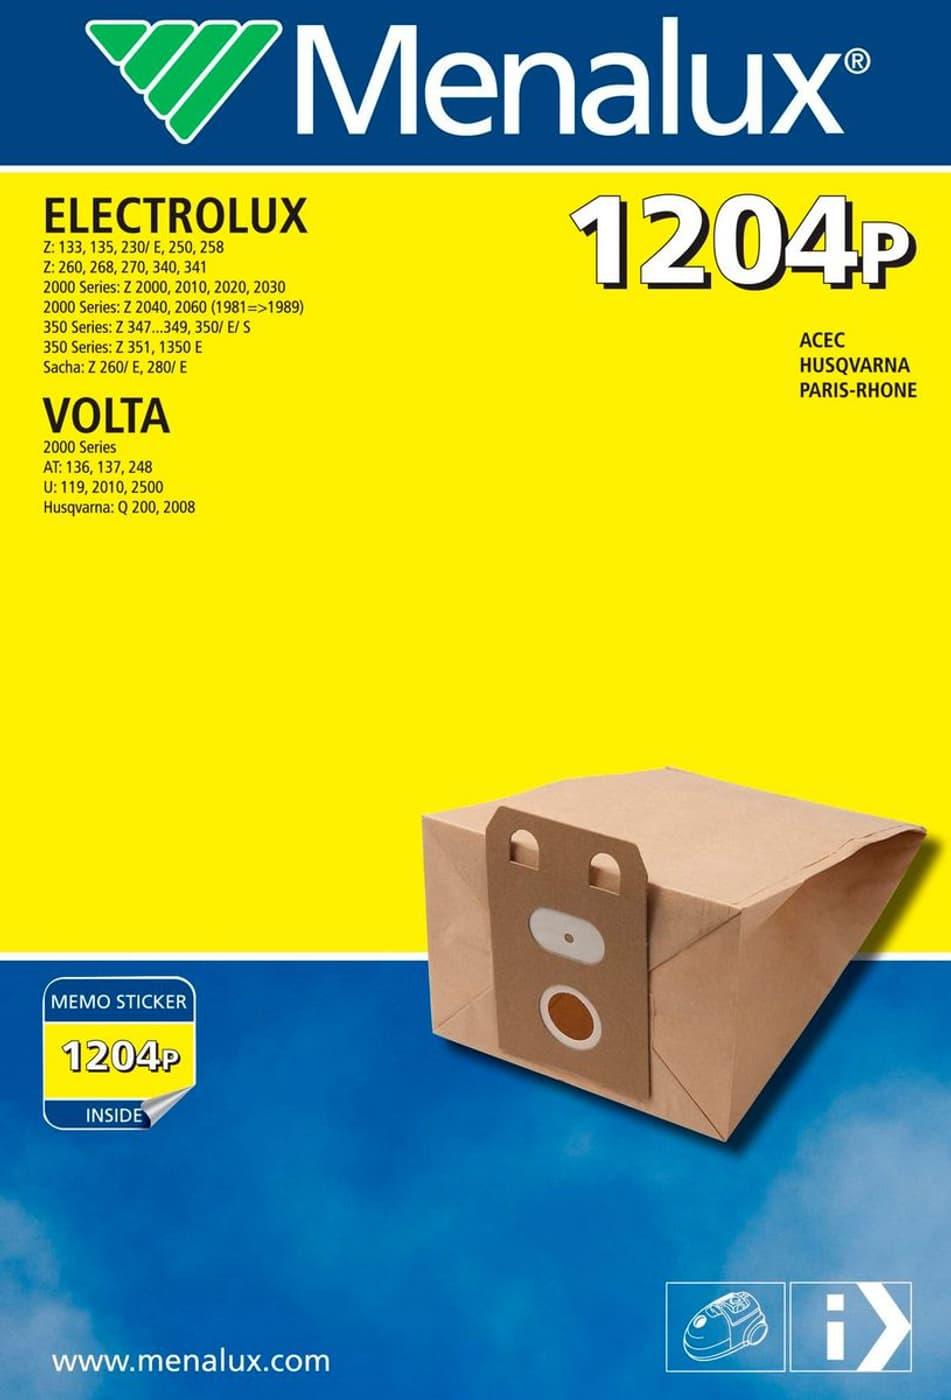 Menalux 1204P Staubsauger-Staubbeutel | Migros